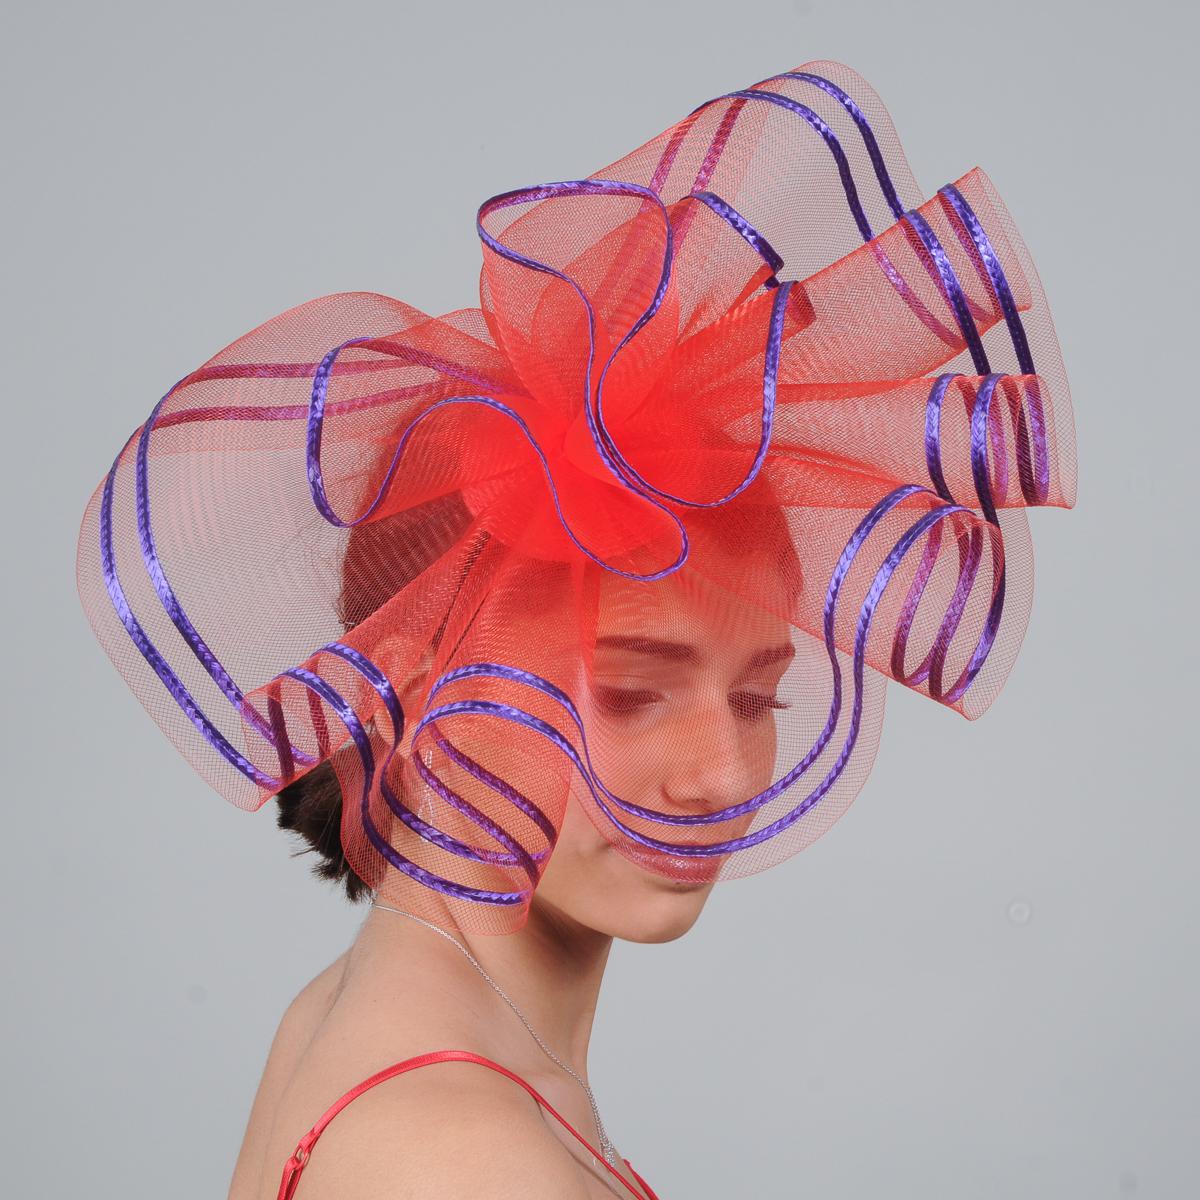 Red Crin Ruffle Fascinator Cocktails Hats-Sun Yorkos  d8d079187c4